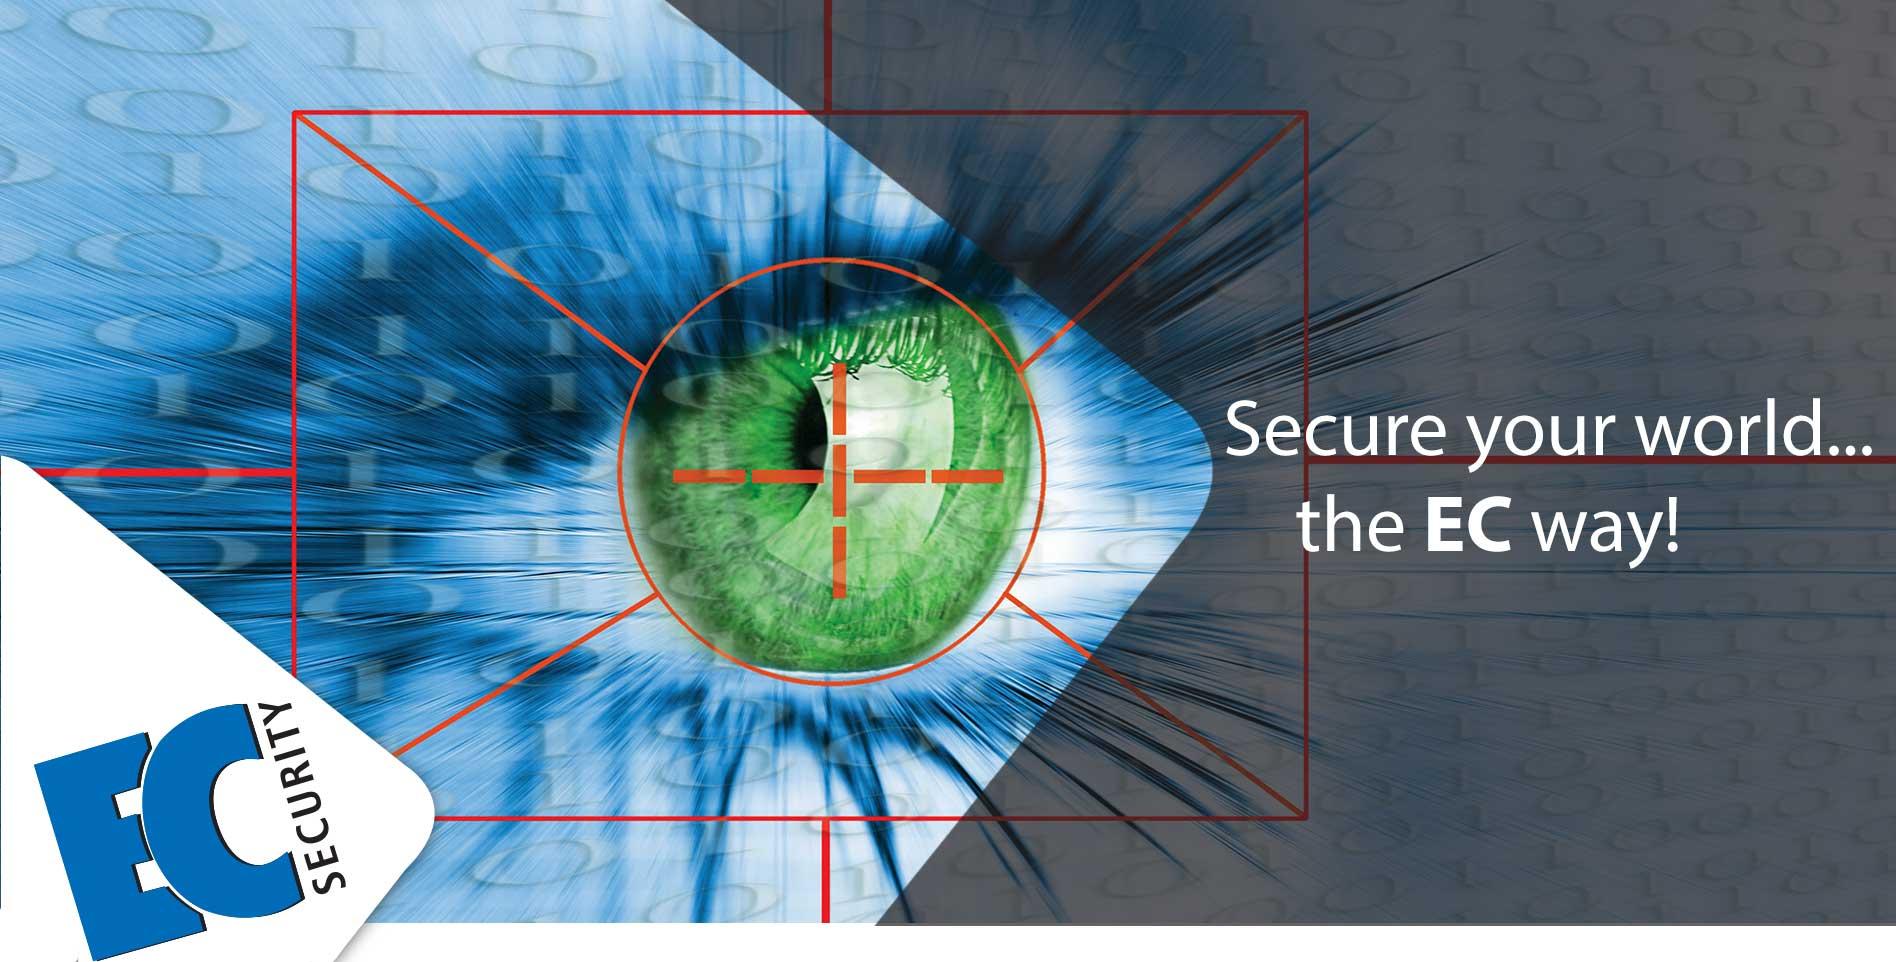 EC Security Web banner with slogan